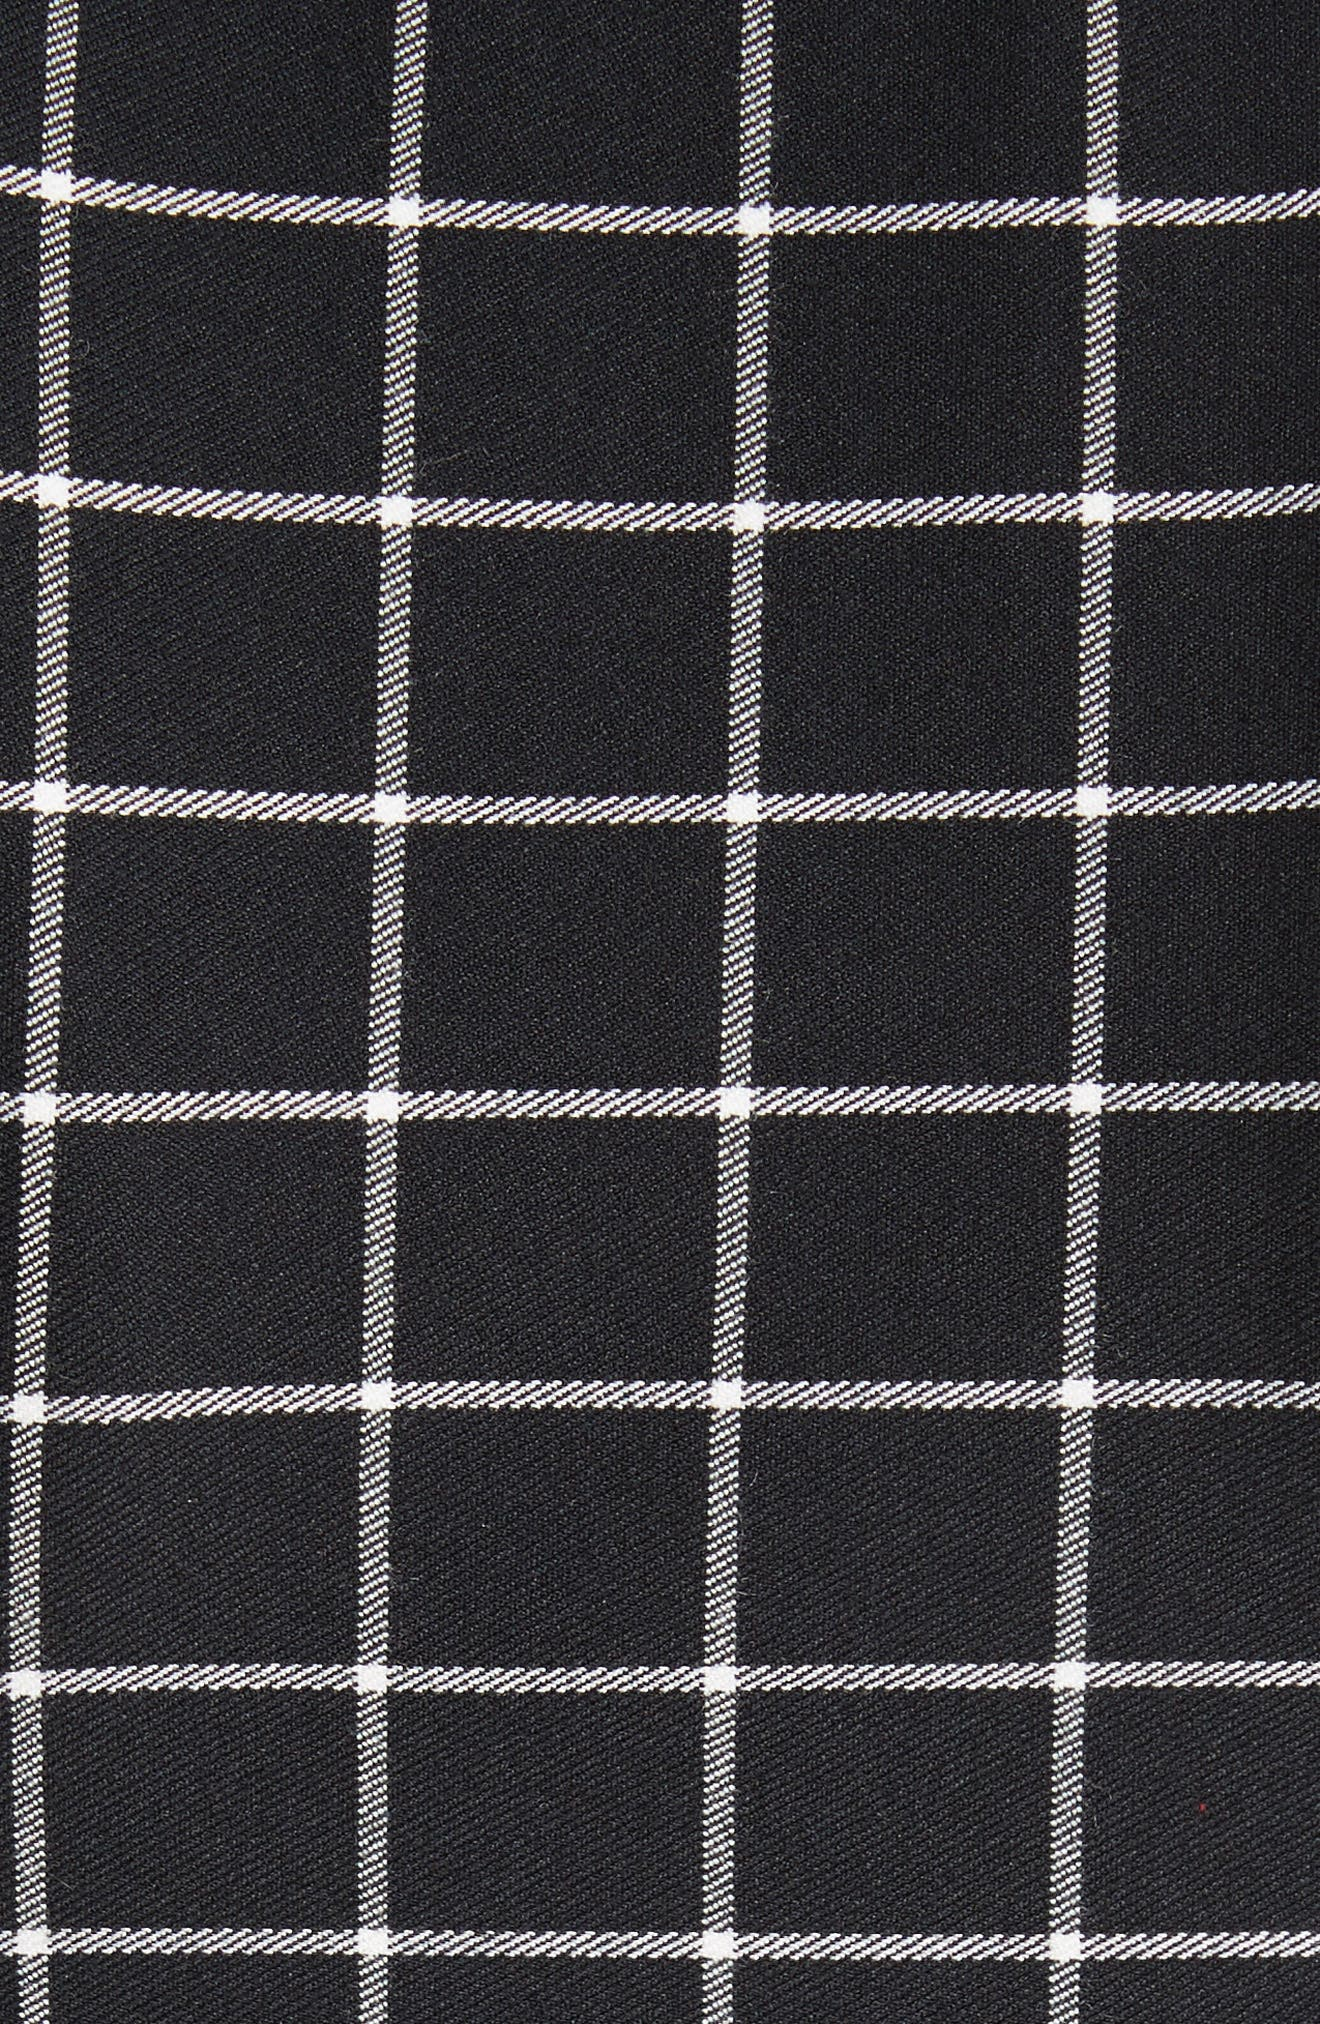 Windowpane Print Cold Shoulder Top,                             Alternate thumbnail 5, color,                             Black/ White Plaid